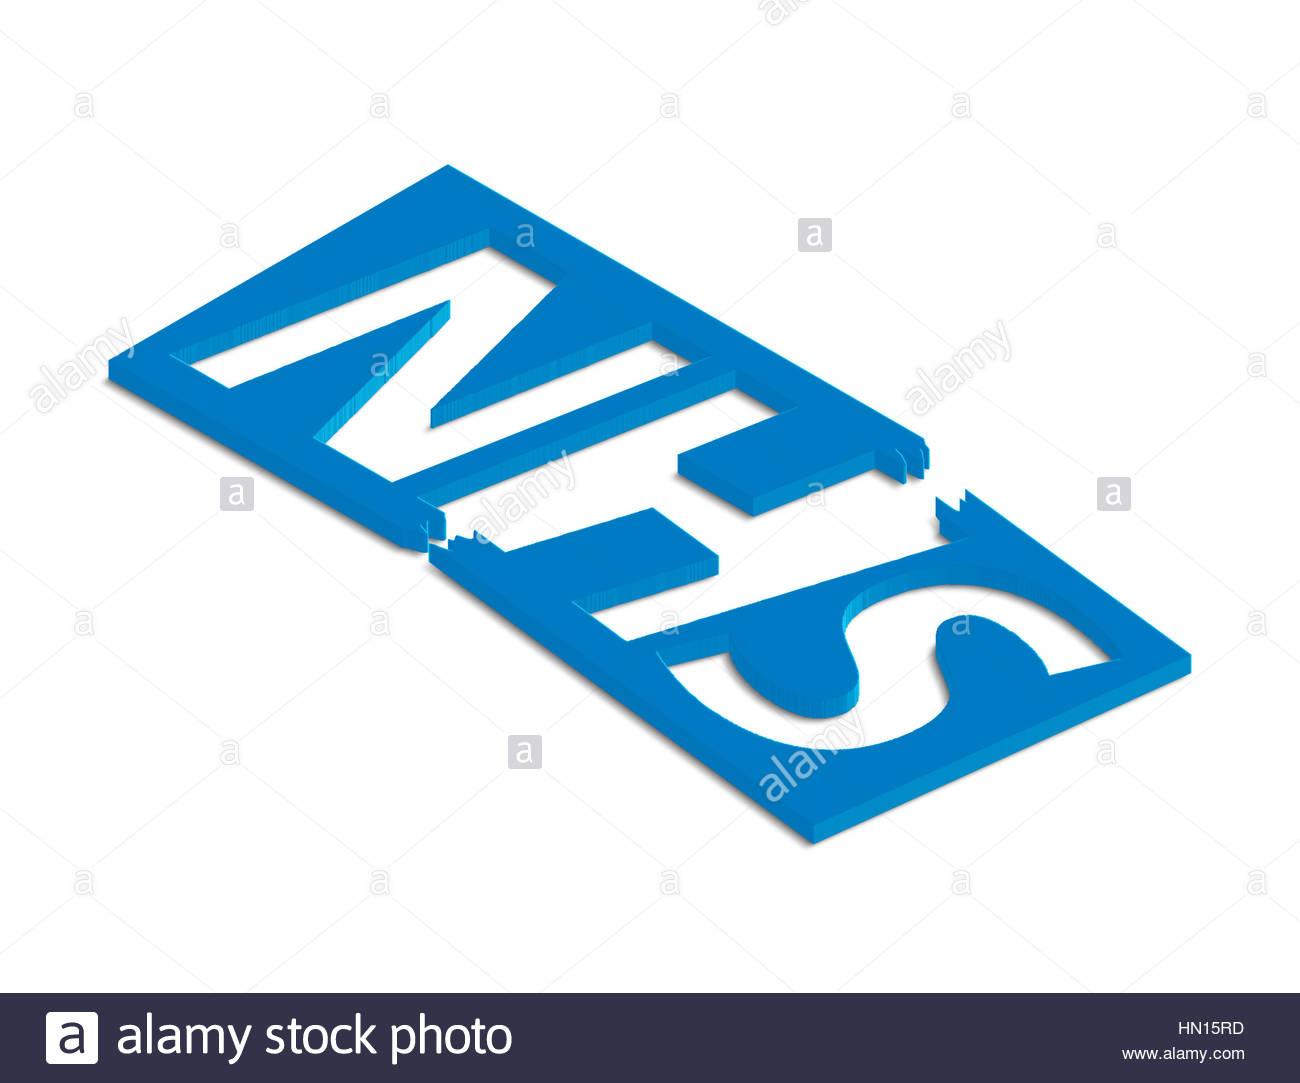 Digital composite - crisis in the NHS, broken 3d NHS logo. - Stock Image